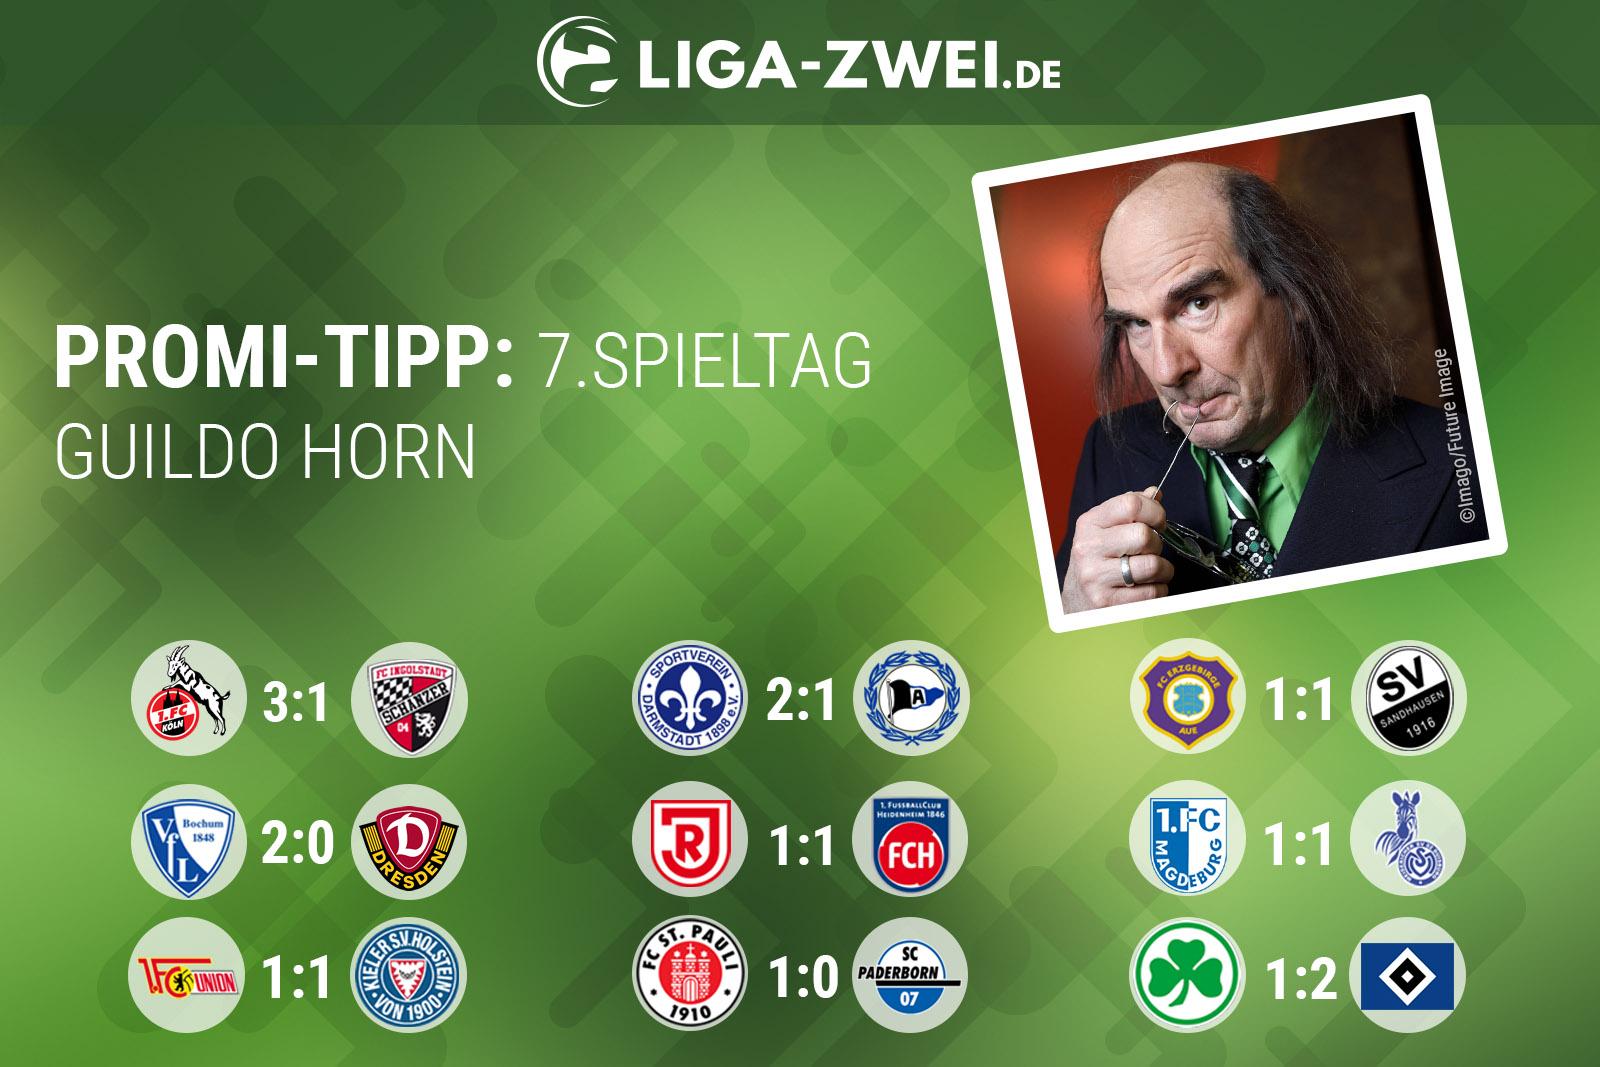 Guildo Horn beim Liga-Zwei.de Promi-Tipp